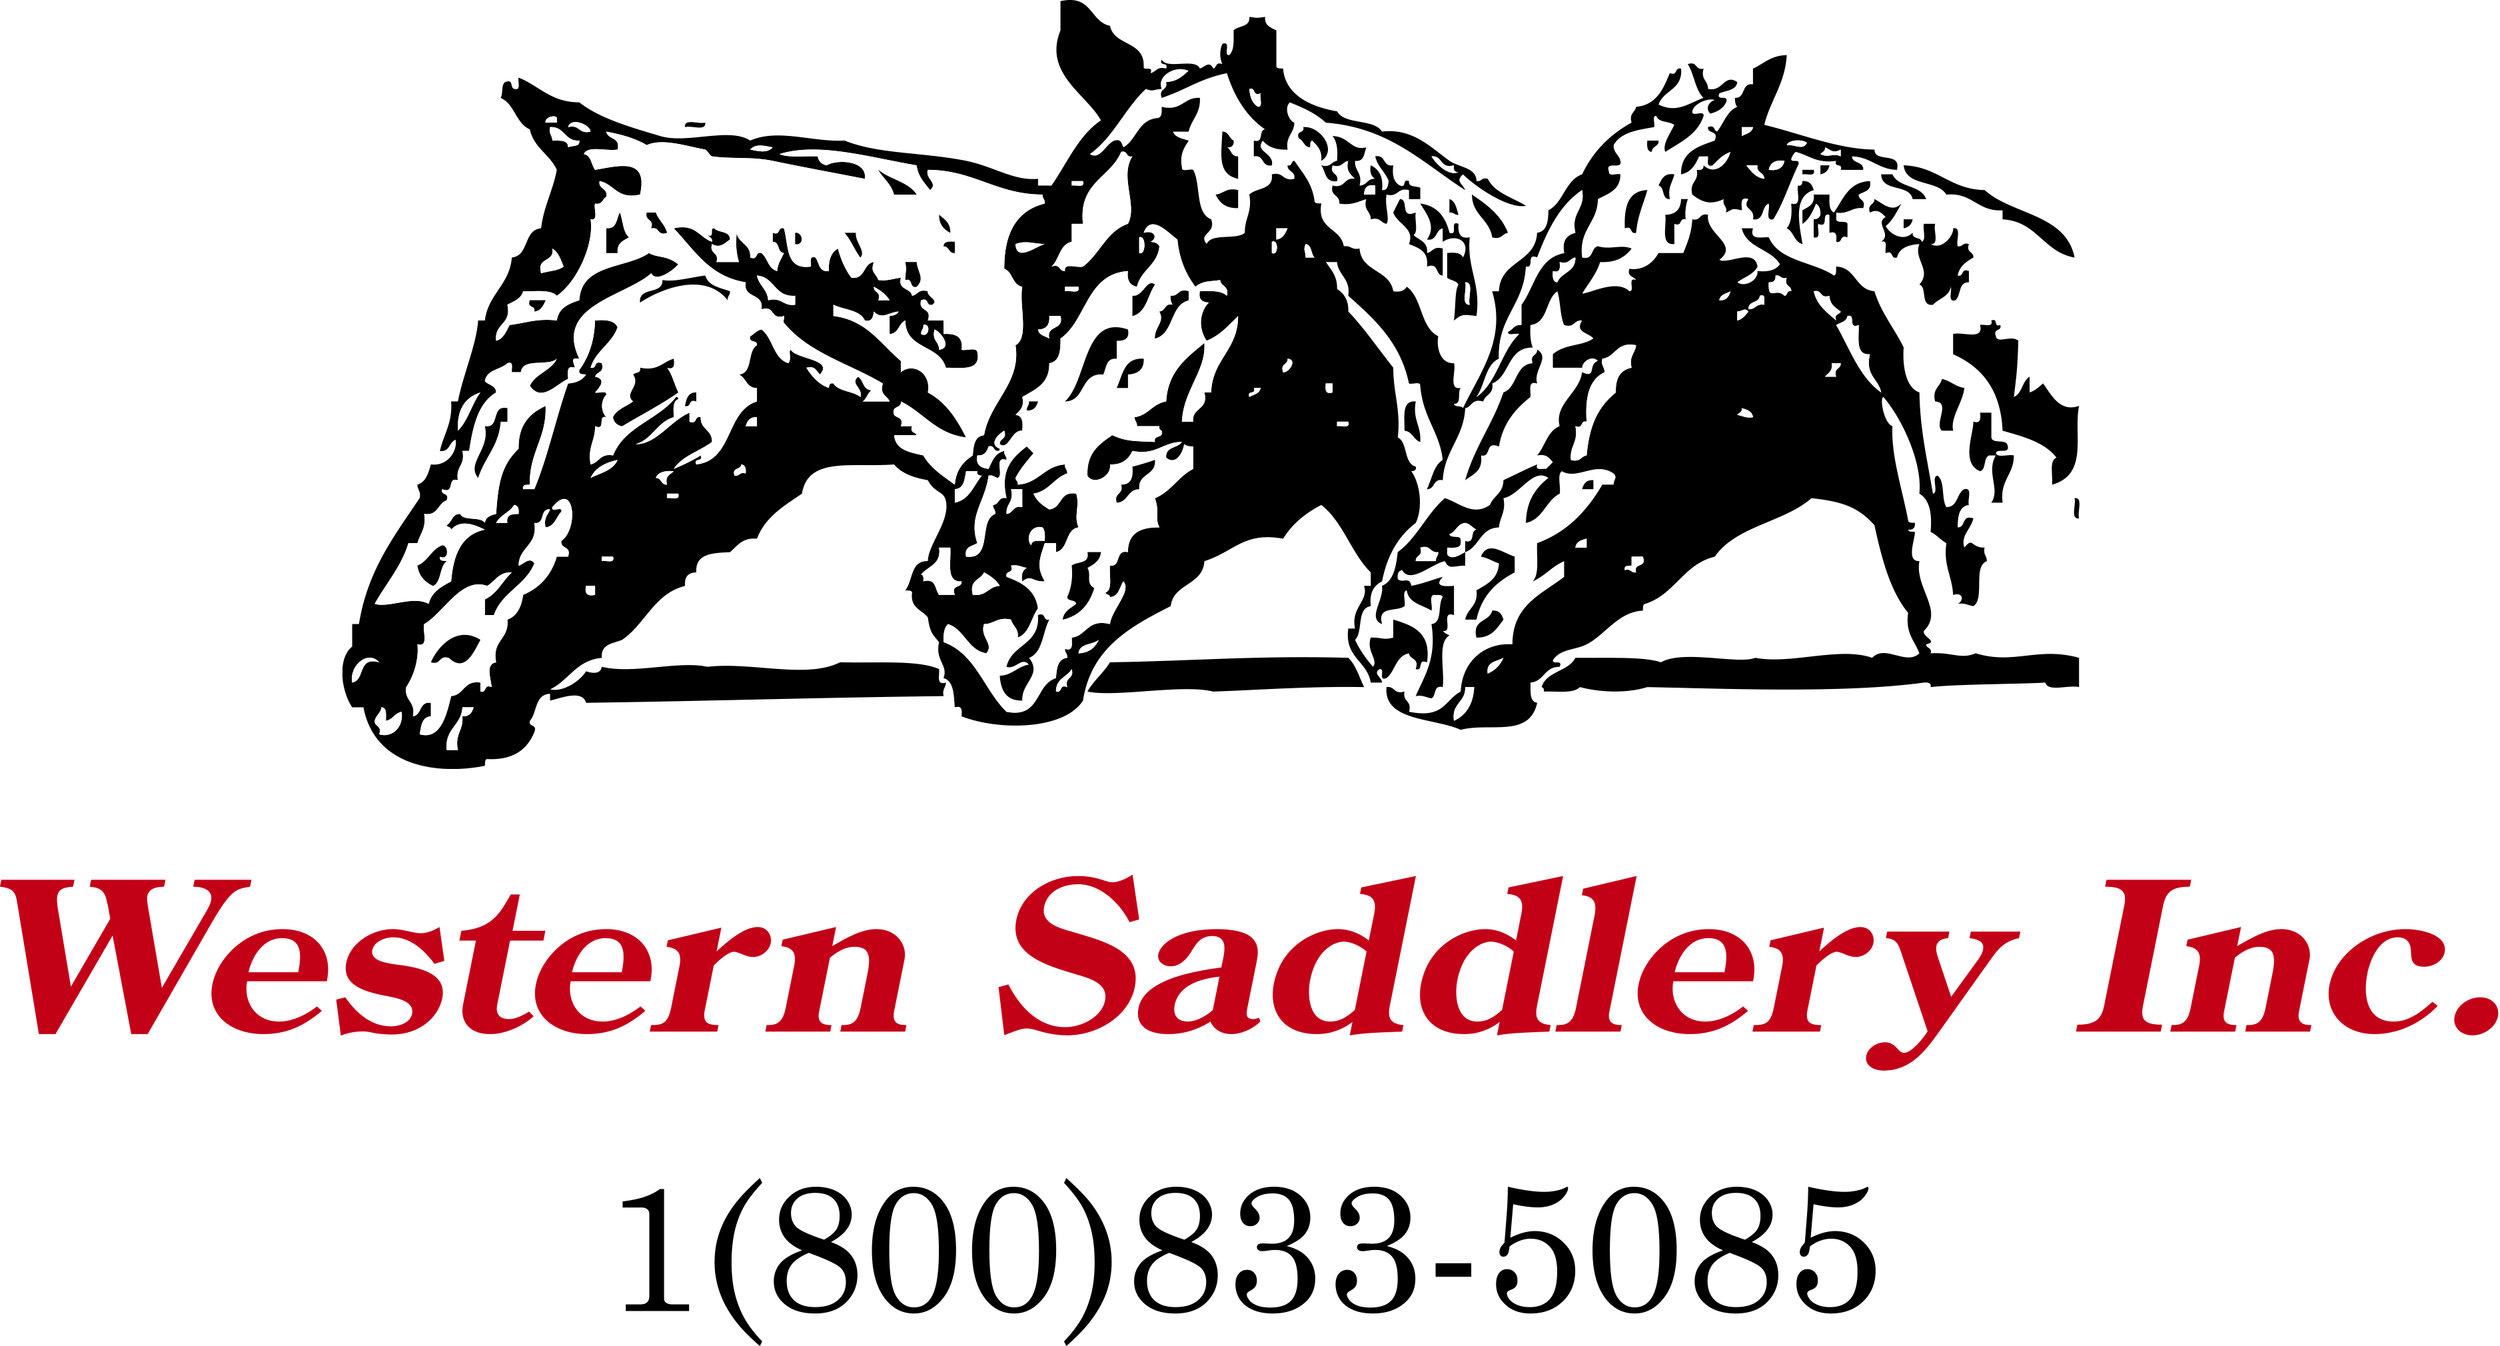 Western Saddlery